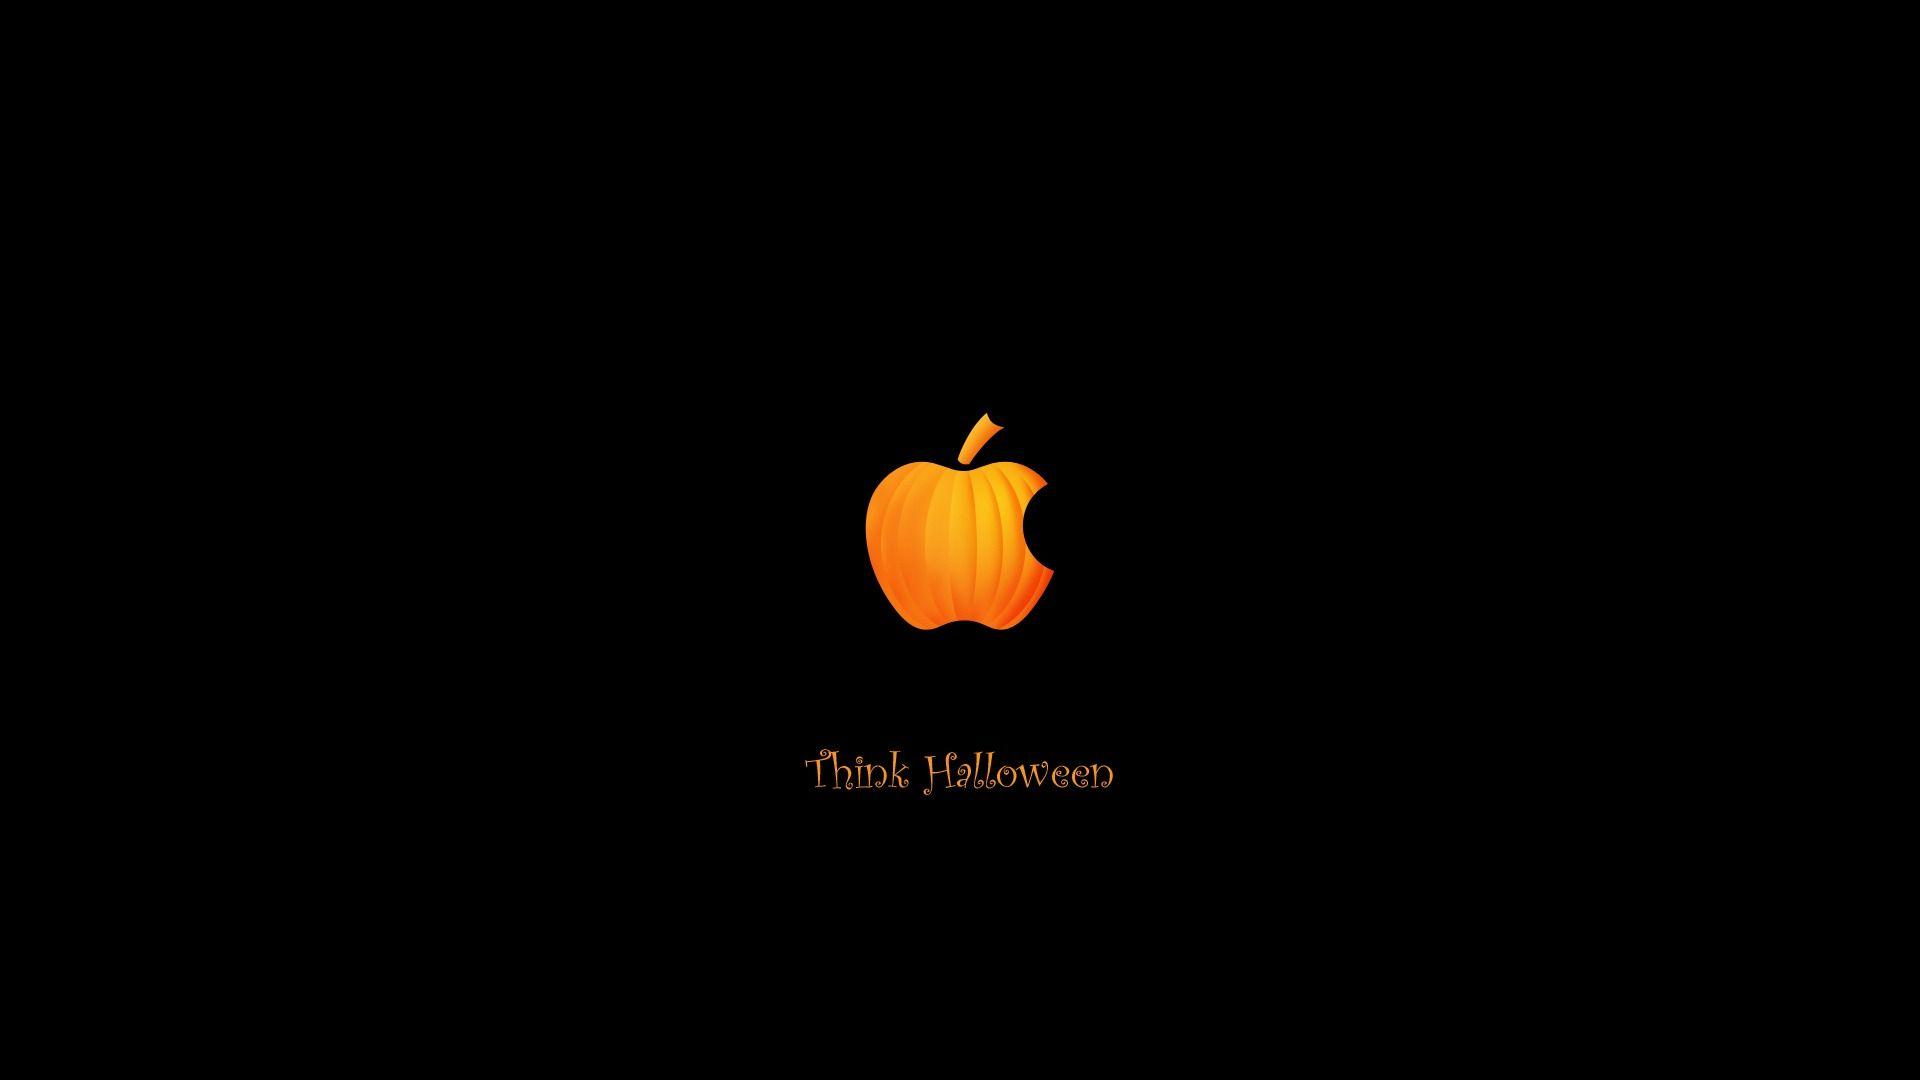 Top Wallpaper Halloween Macbook Air - 5a4601cafa94b165ea076cf9420234aa  Perfect Image Reference_887234.jpg